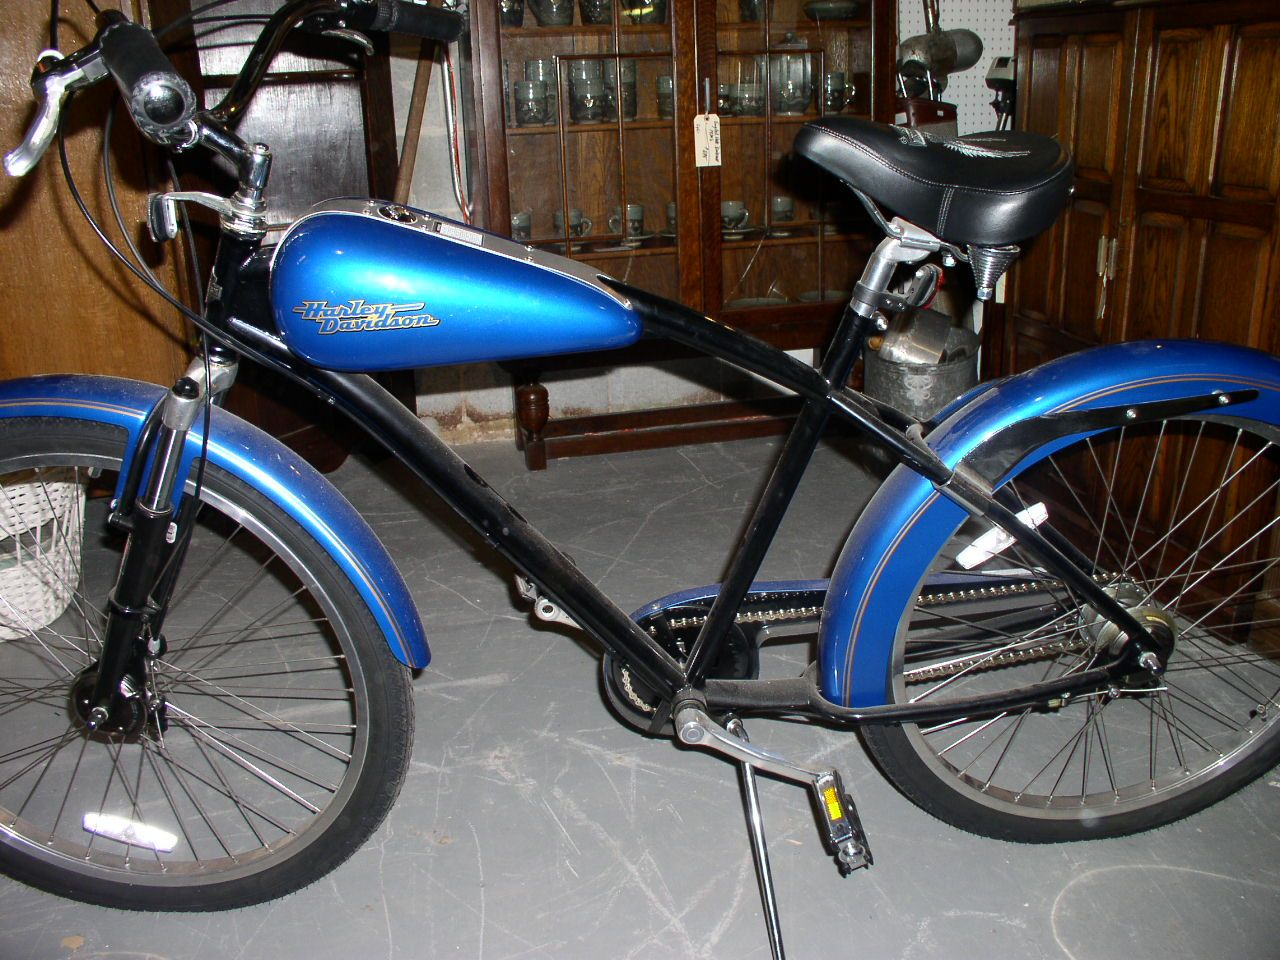 Rare Limited Edition Harley Davidson Bicycle C 1998 1895